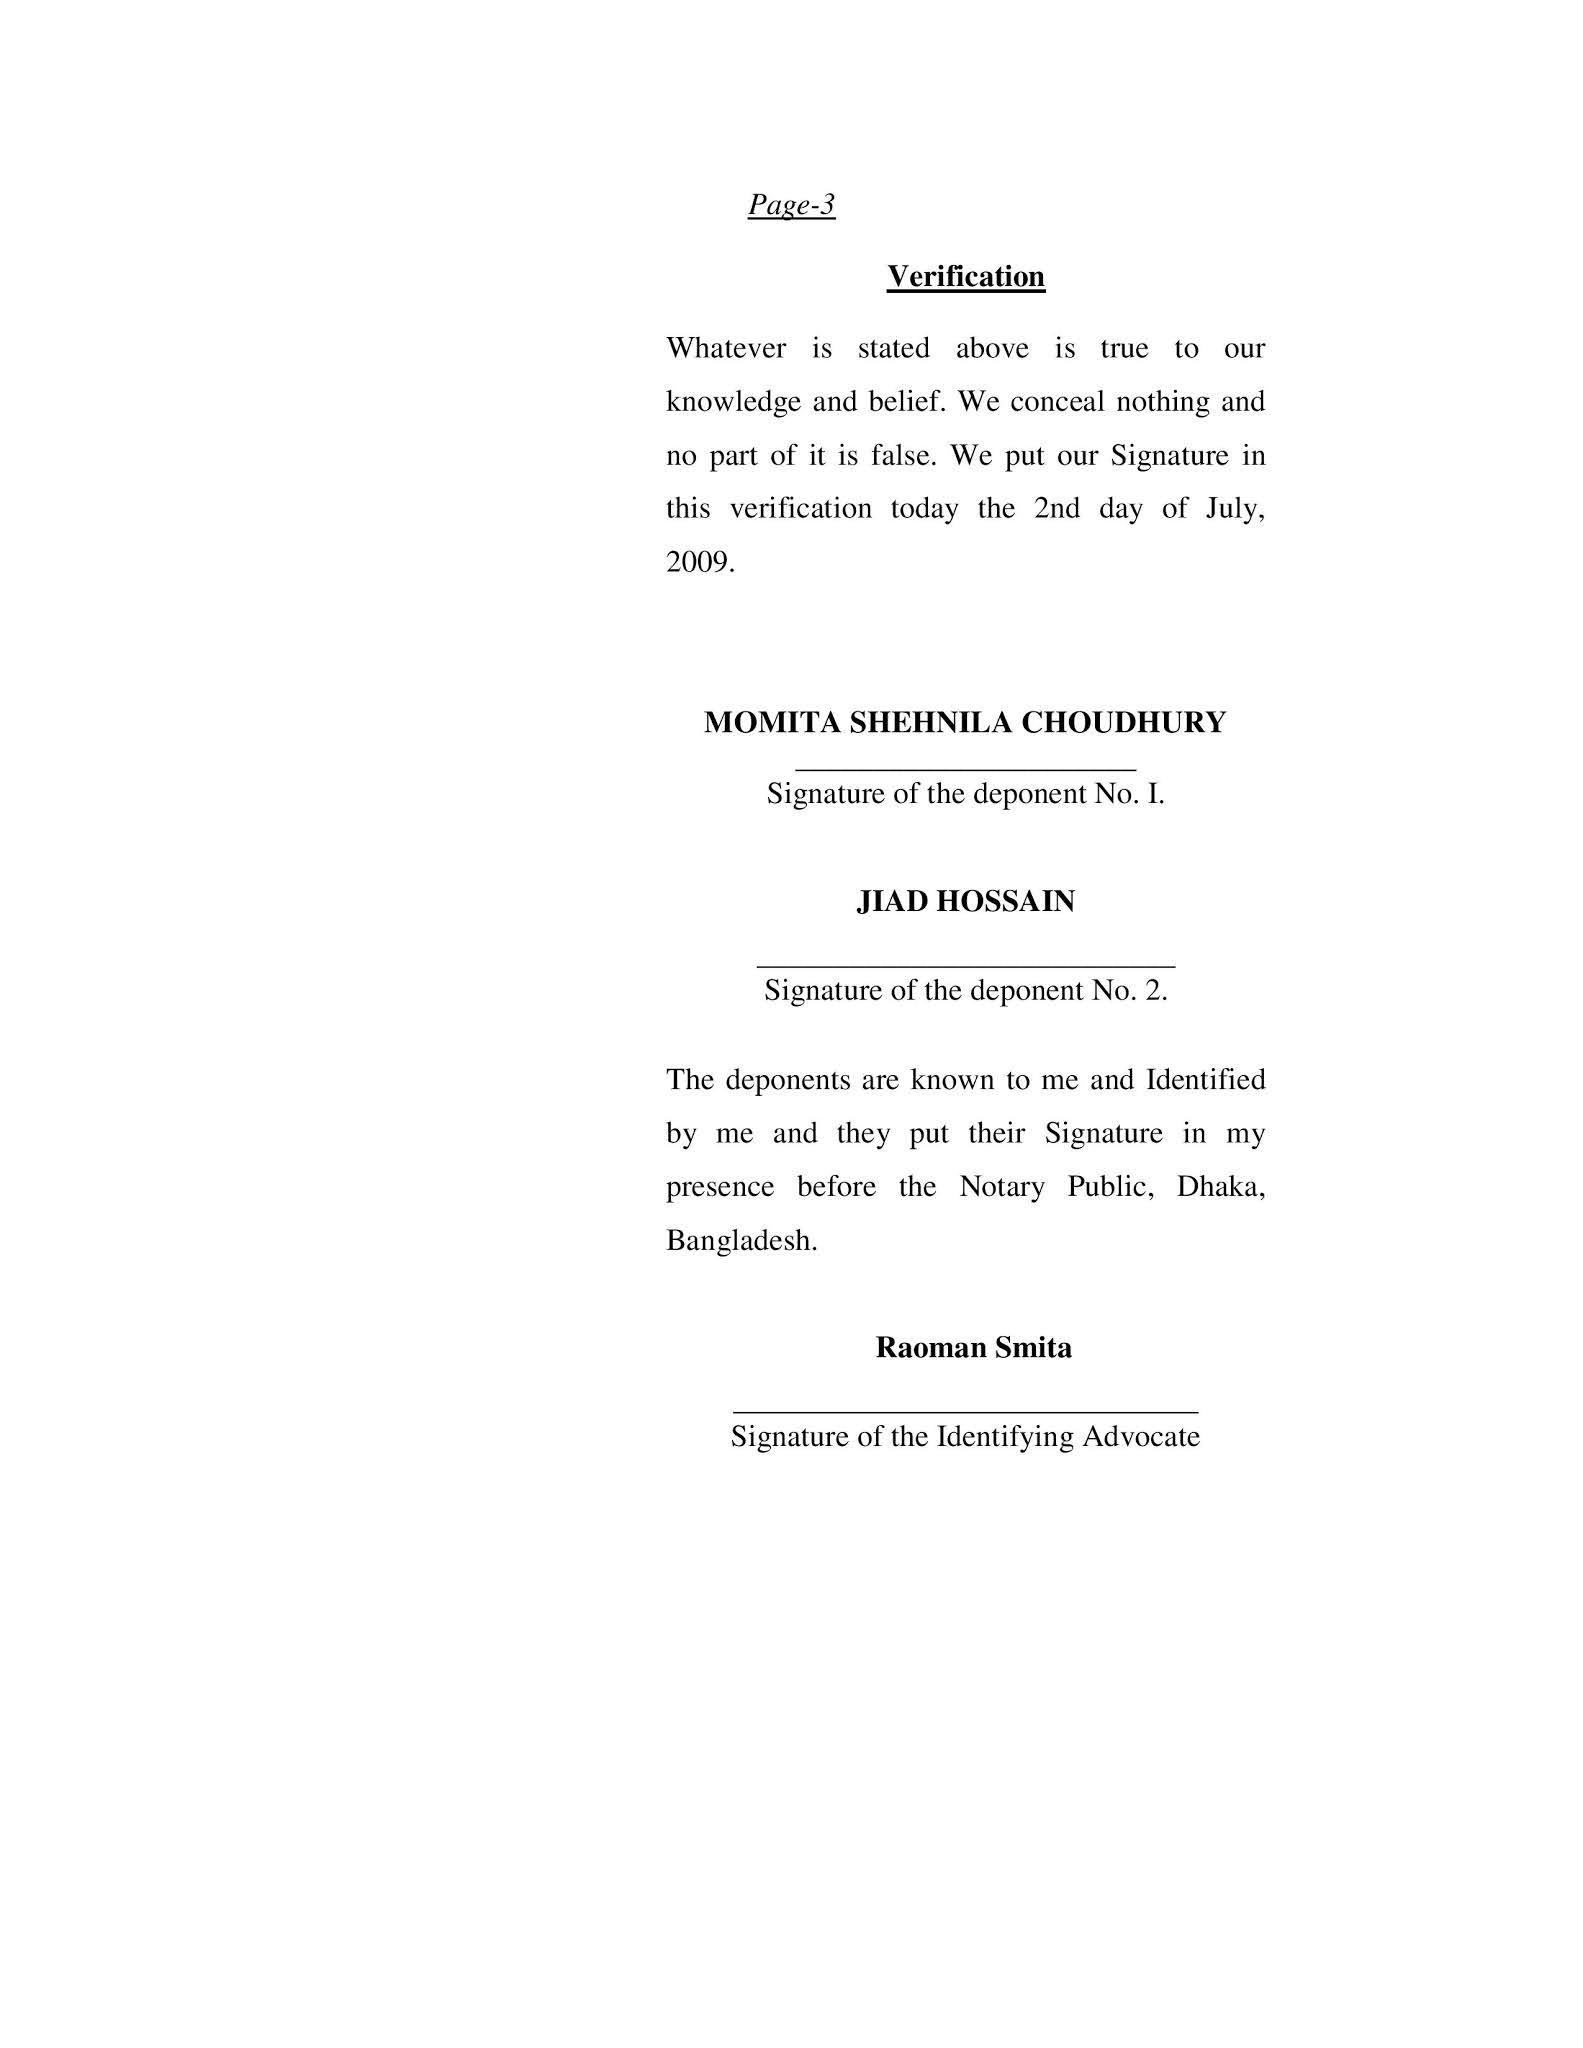 Affidavit of Muslim Marriage